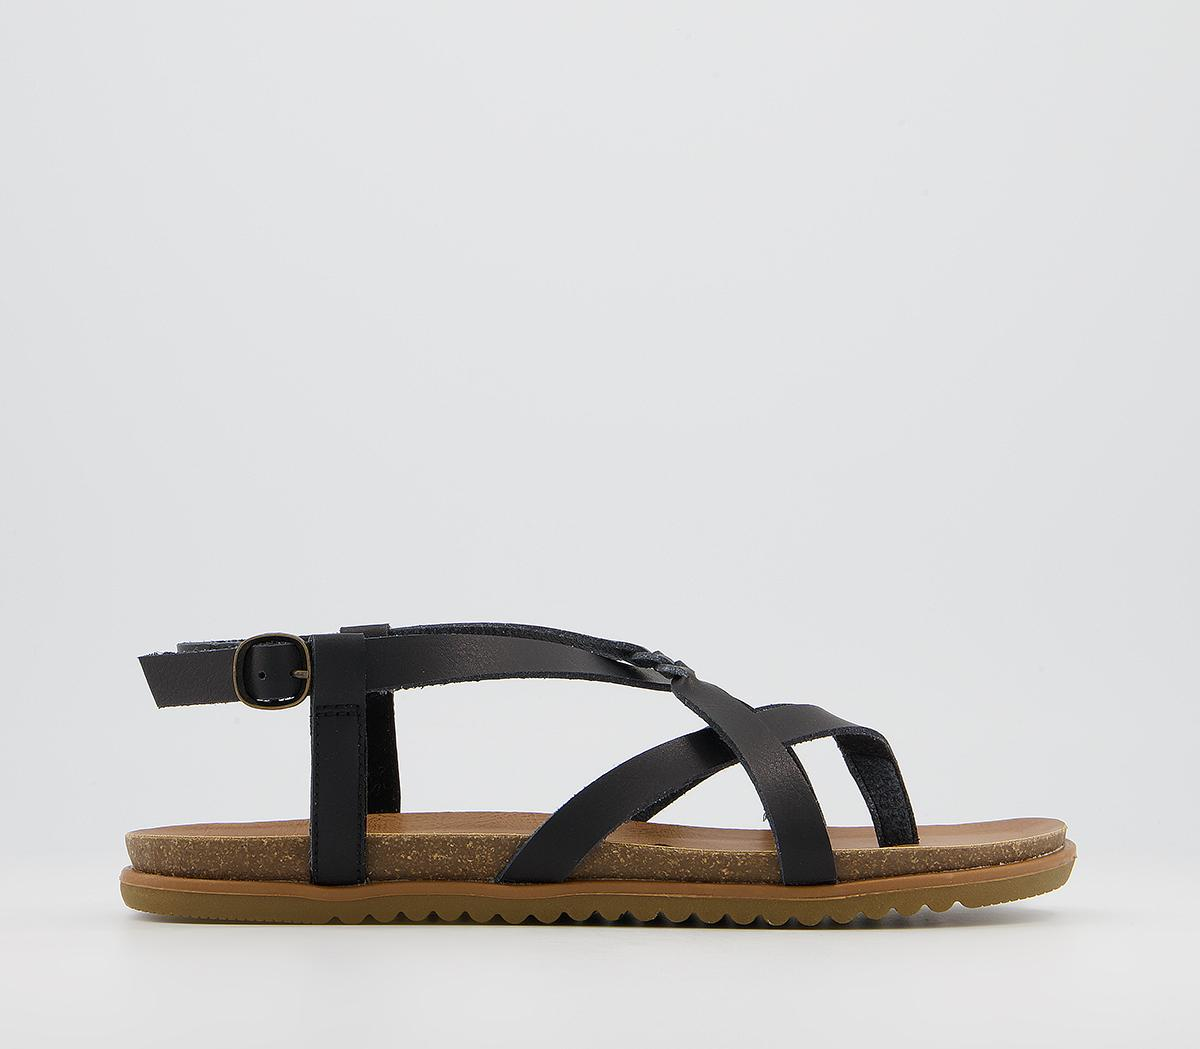 Macarah B Sandals